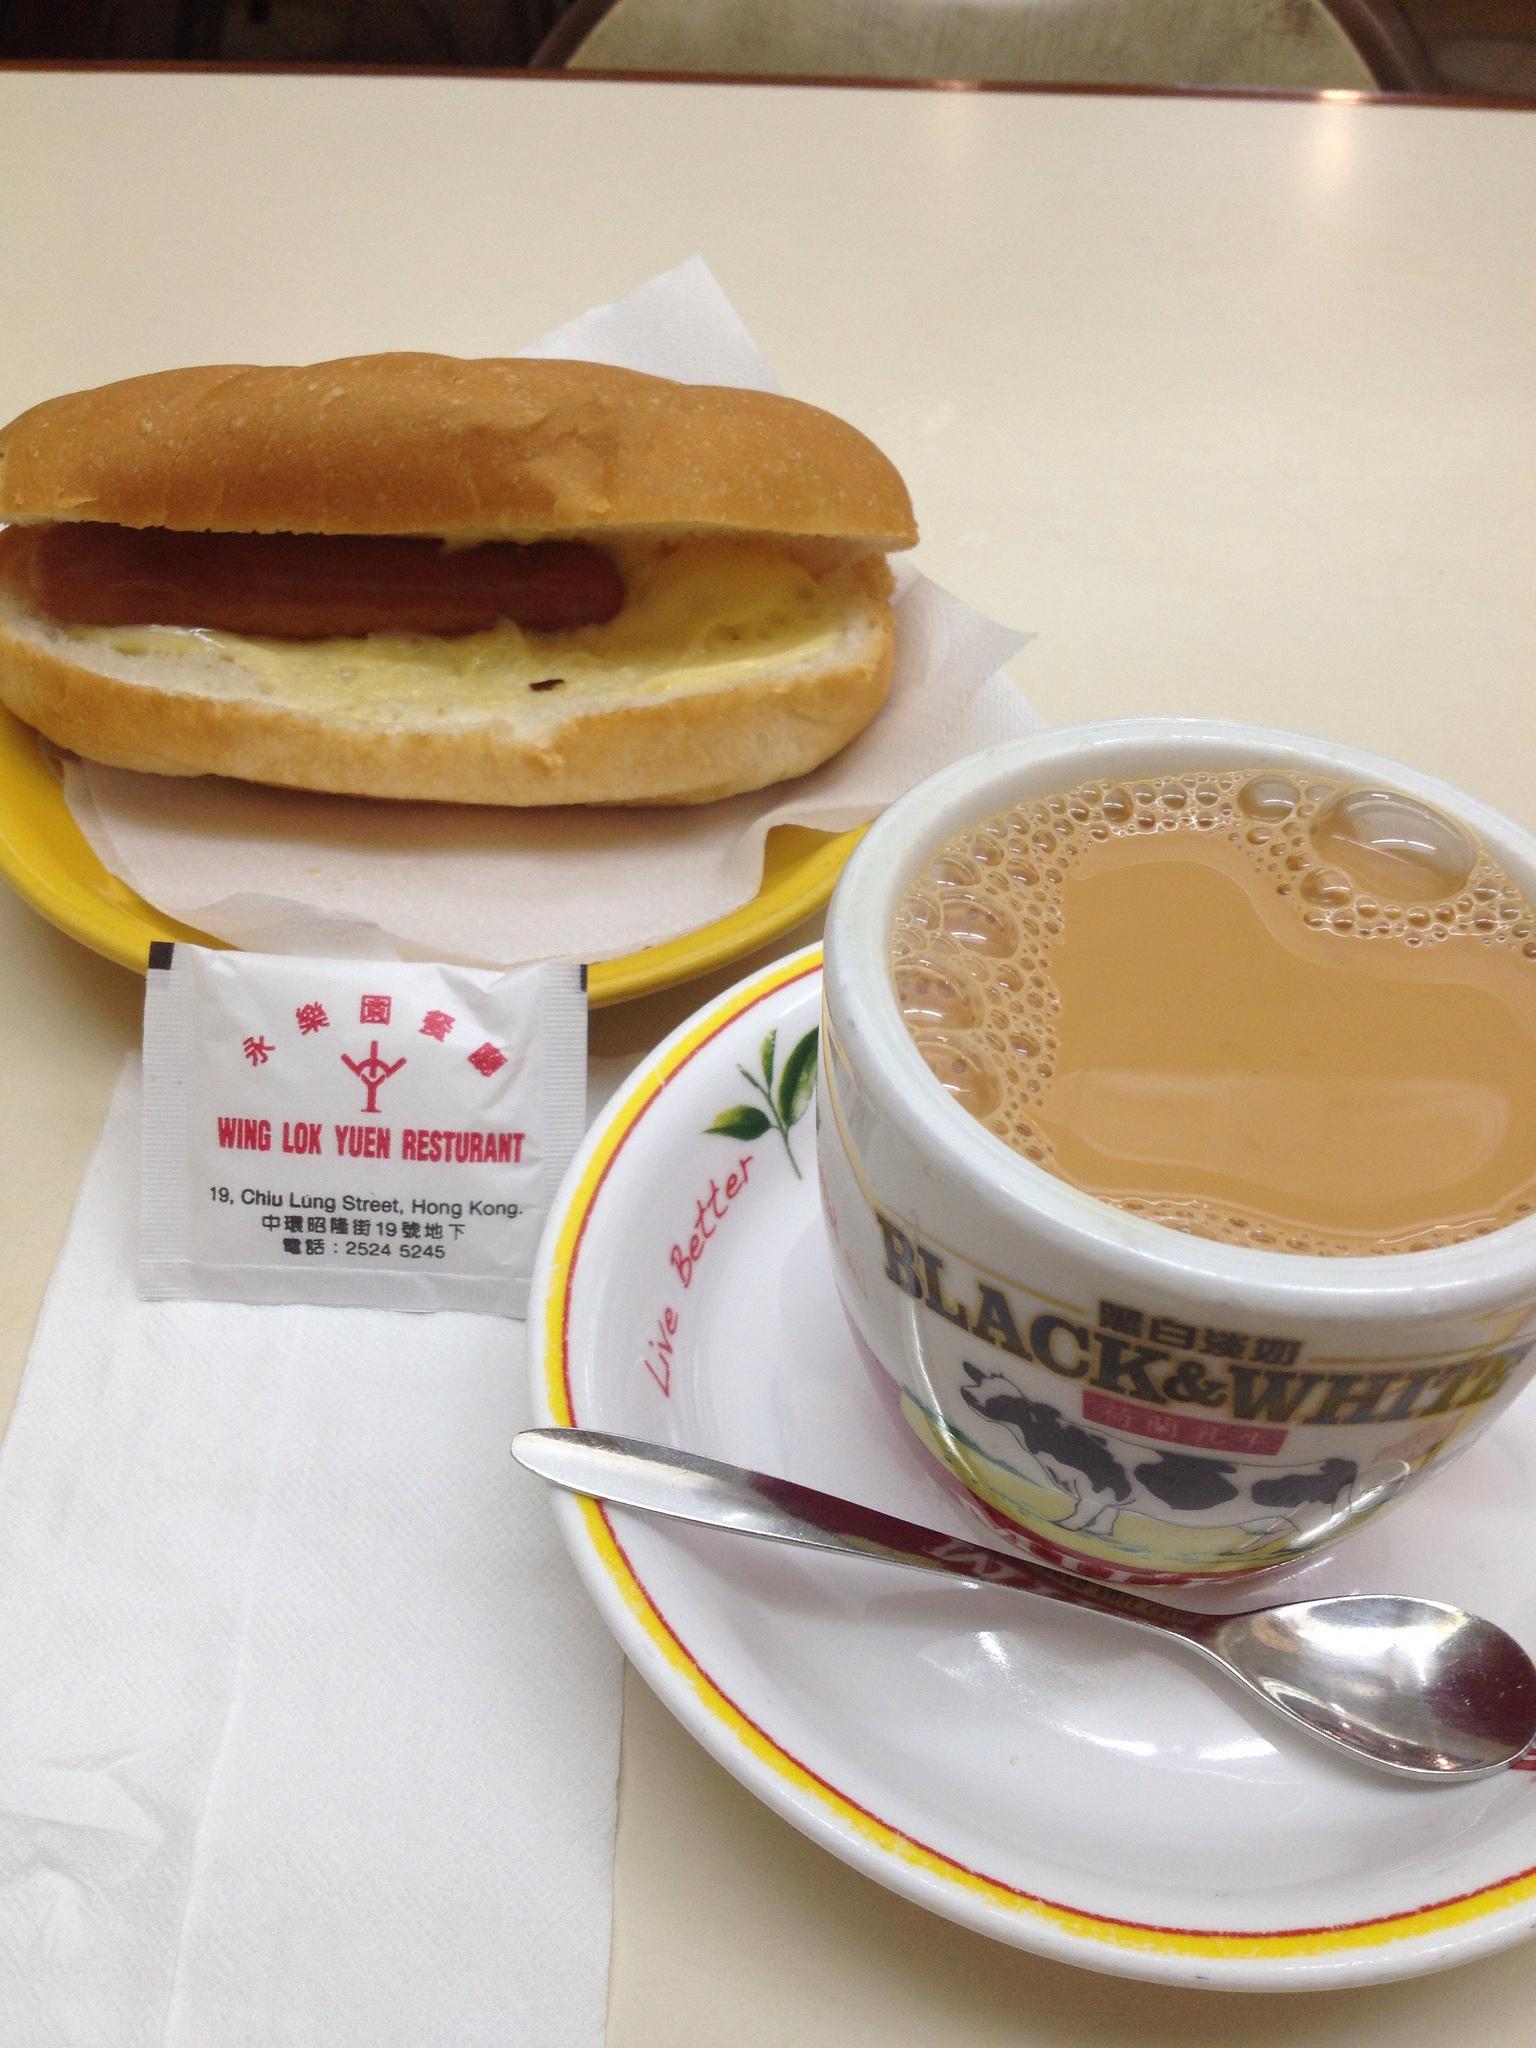 Wing Lok Yuen's hotdog and milk tea